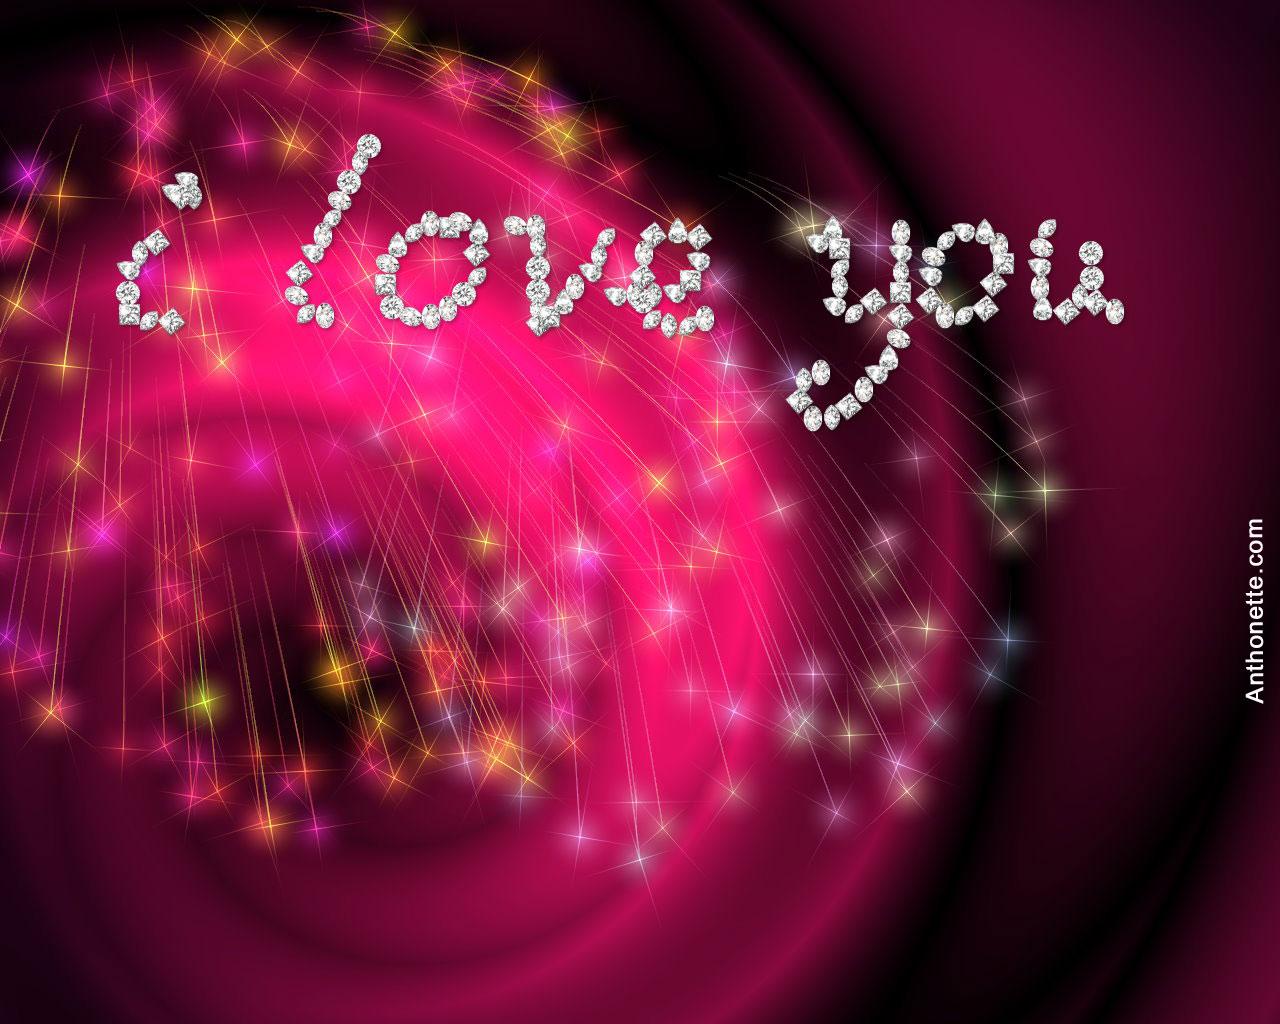 Wallpaper download love hd - I Love You Hd Wallpaper